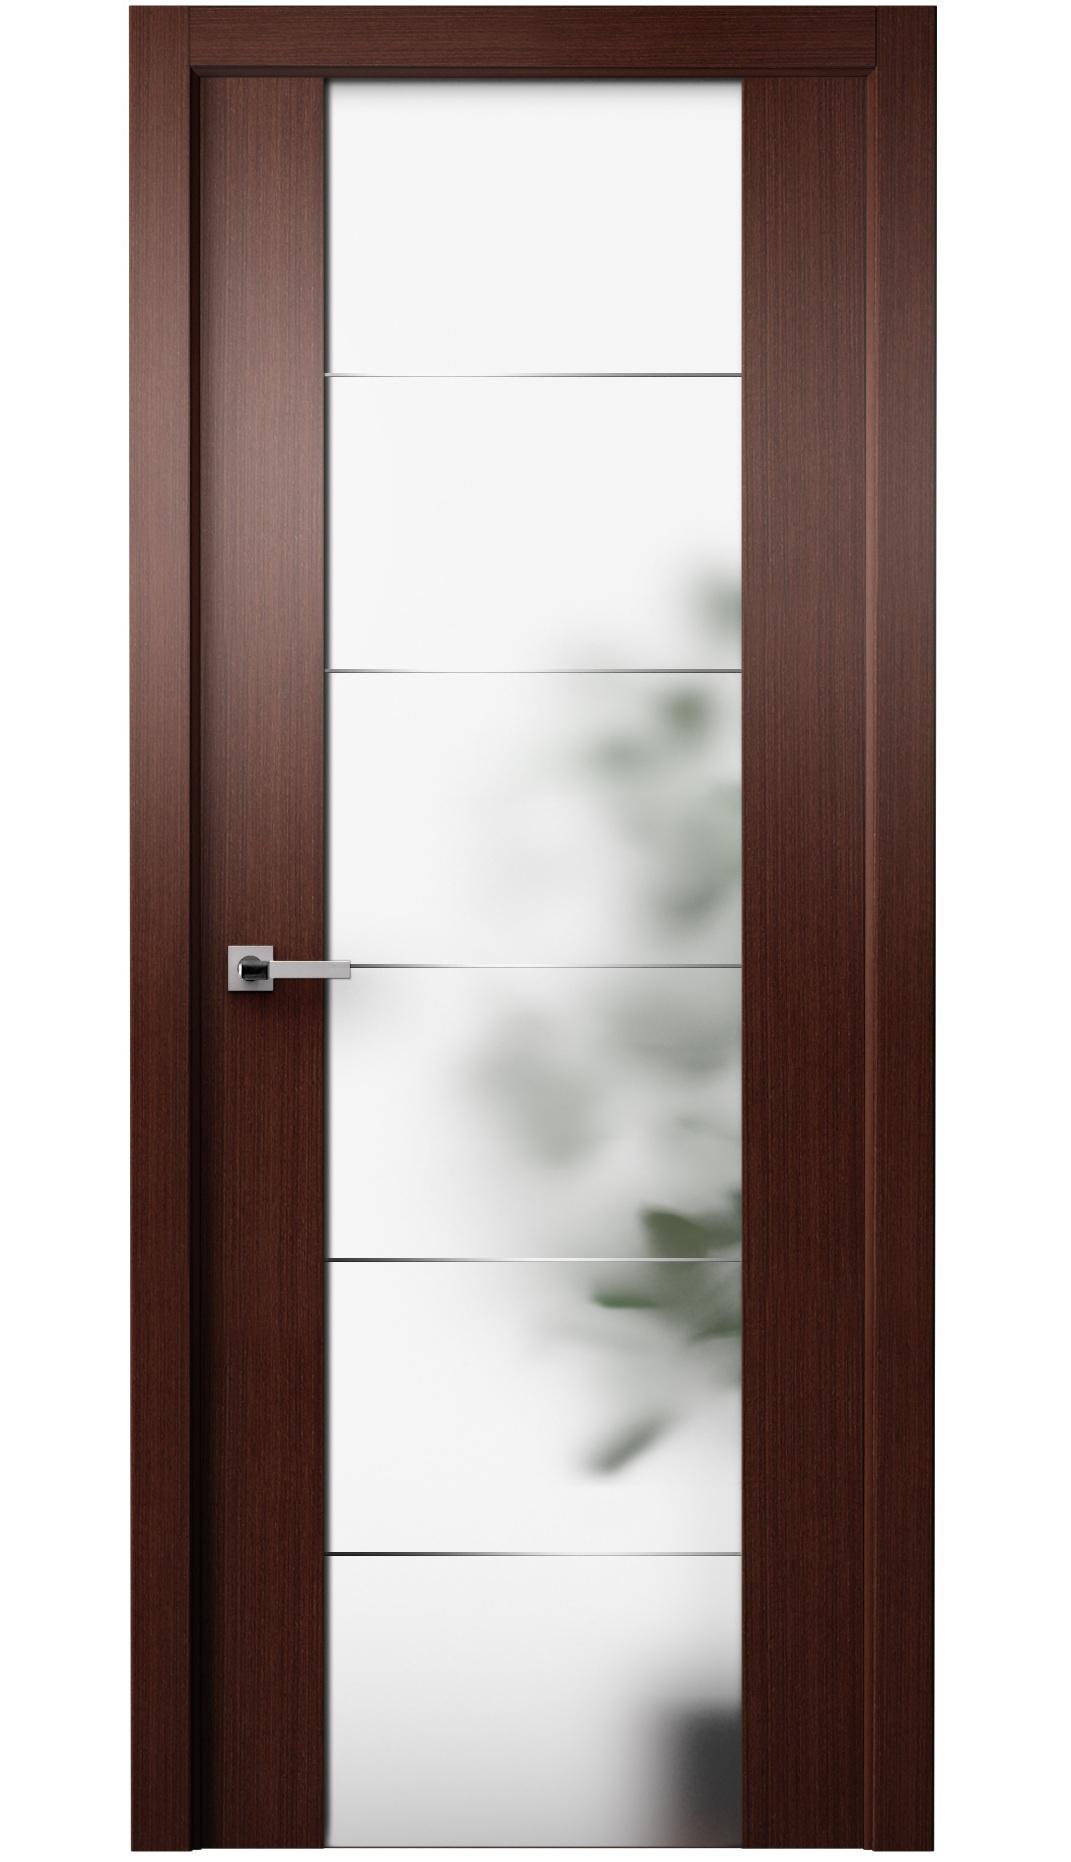 Image Gardi Vetro Interior Door Wenge 0